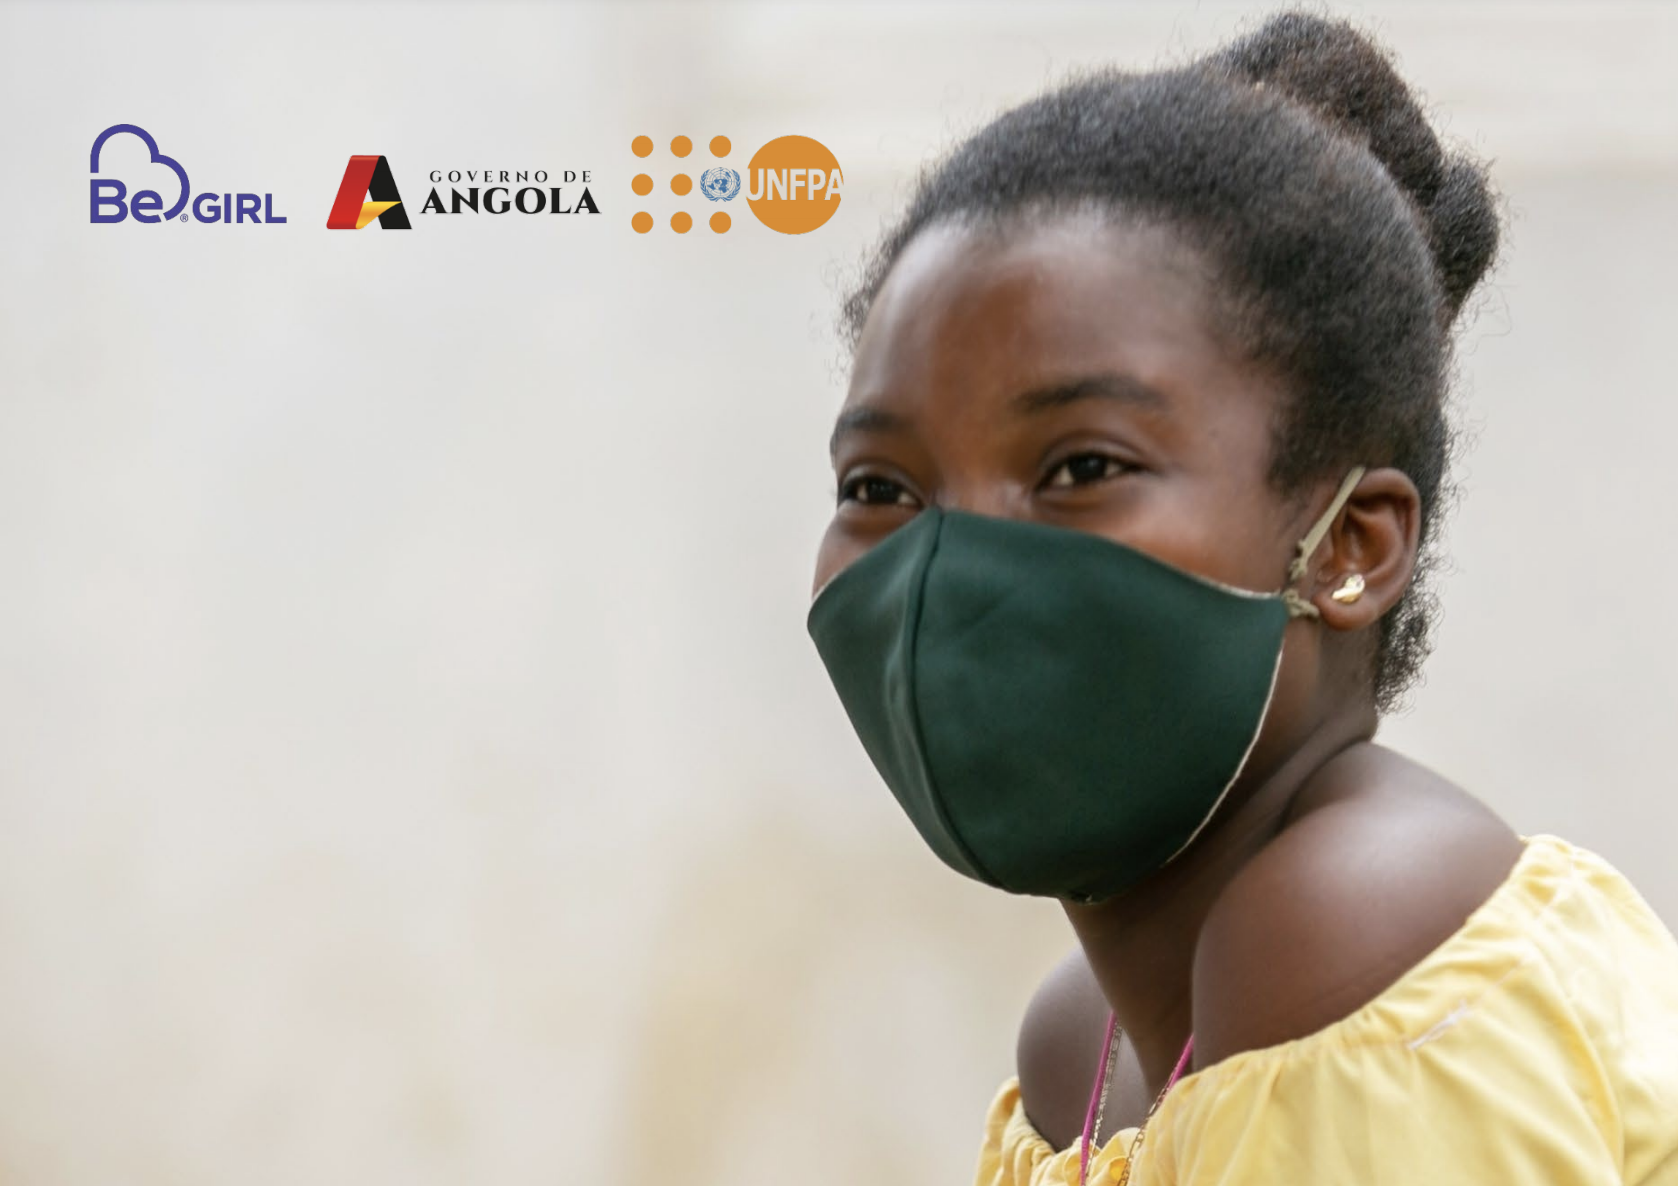 Menstrual Management in Angola, Impact Study